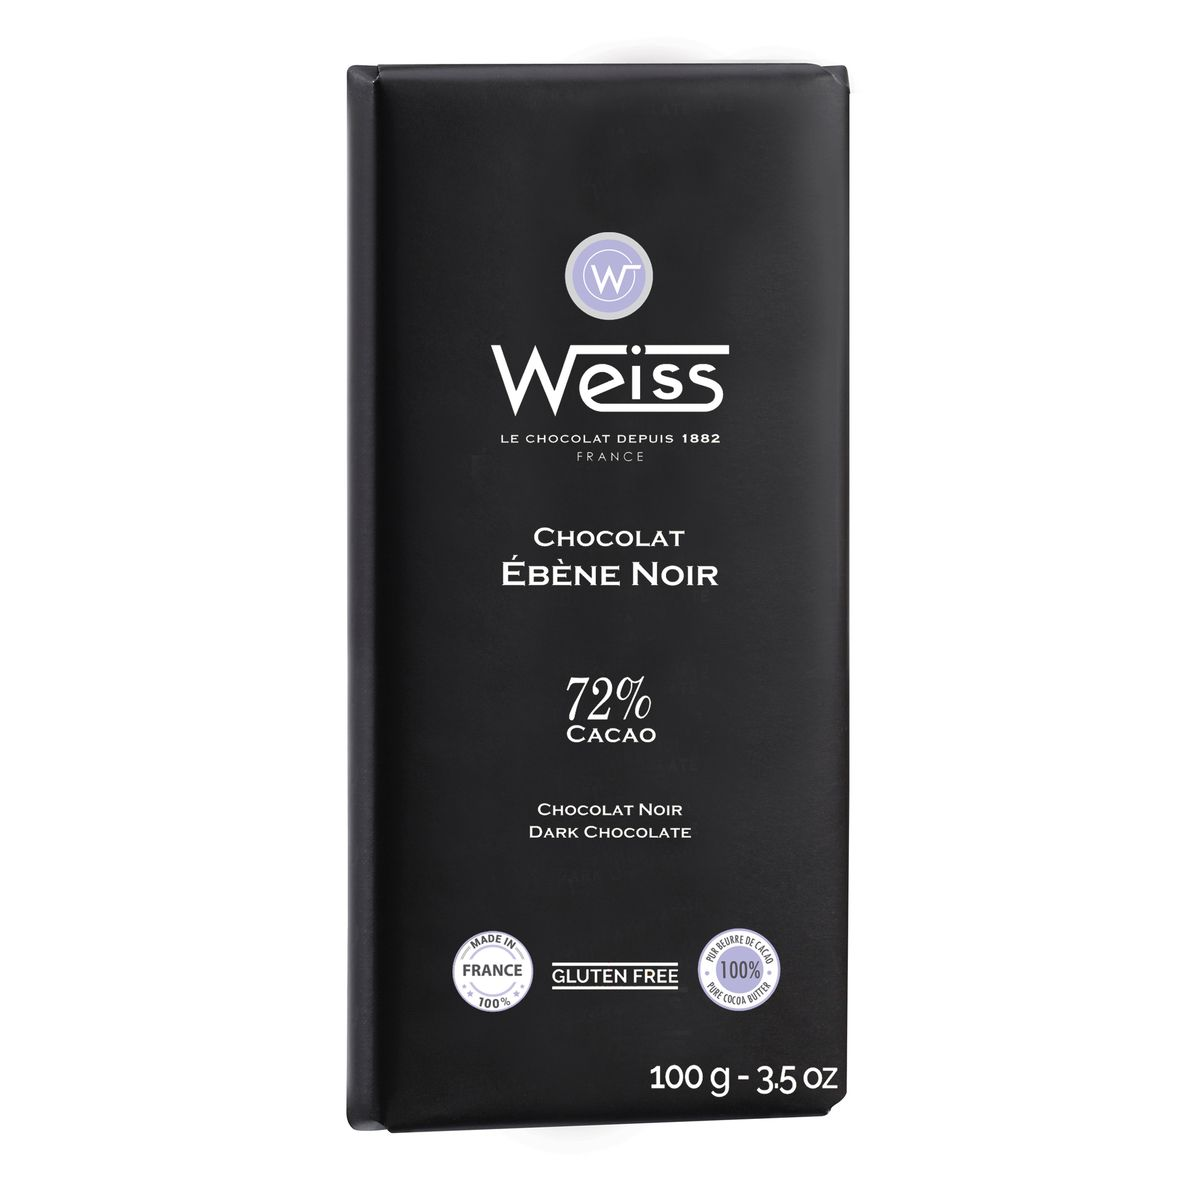 Tablette 100g ebene 72% - Weiss